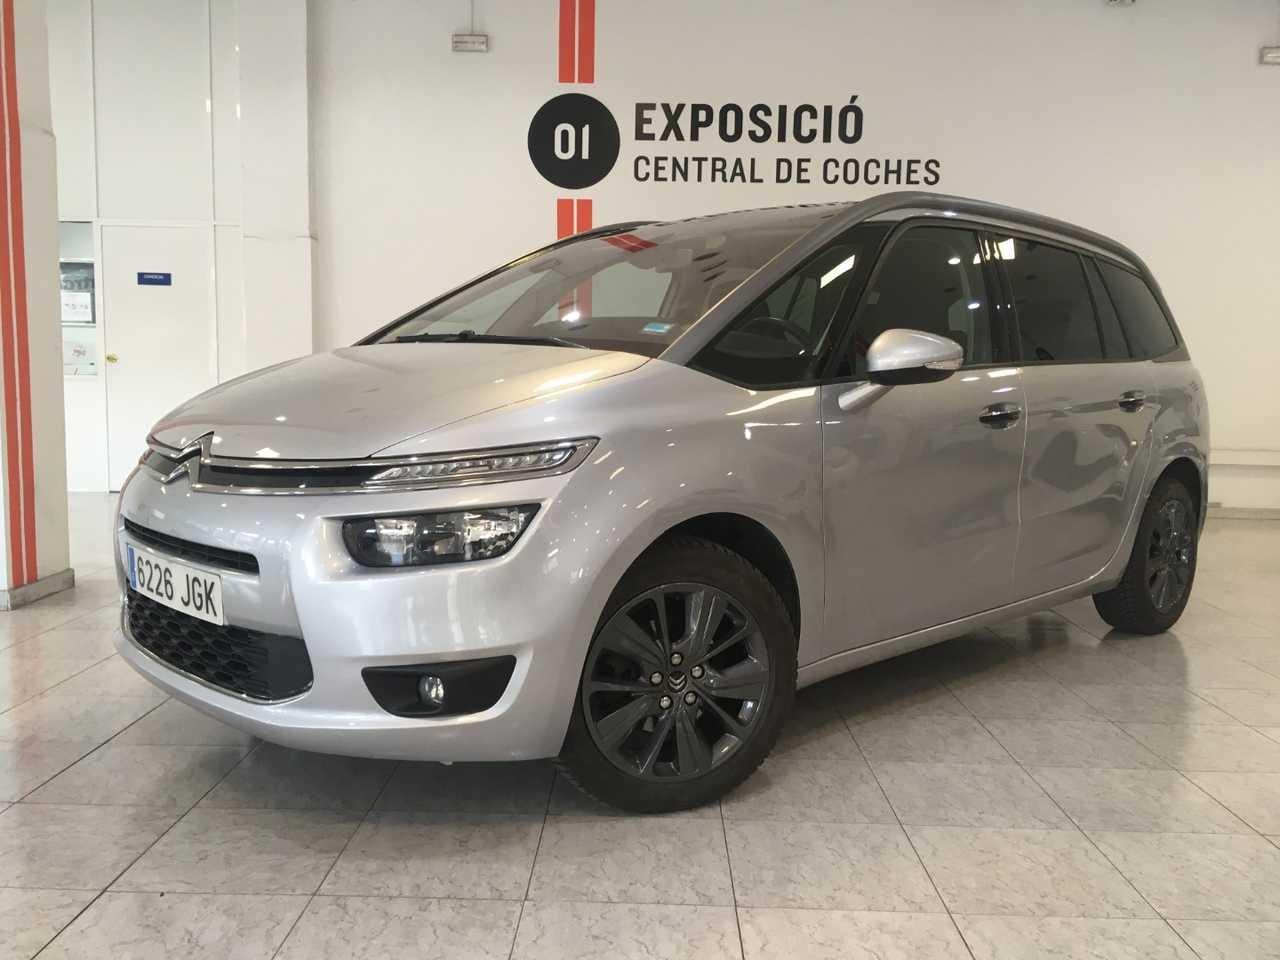 Citroën Grand C4 Picasso 1.6 e-HDI 115cv  Intensive 7 Plazas / Navi / Camara   - Foto 1